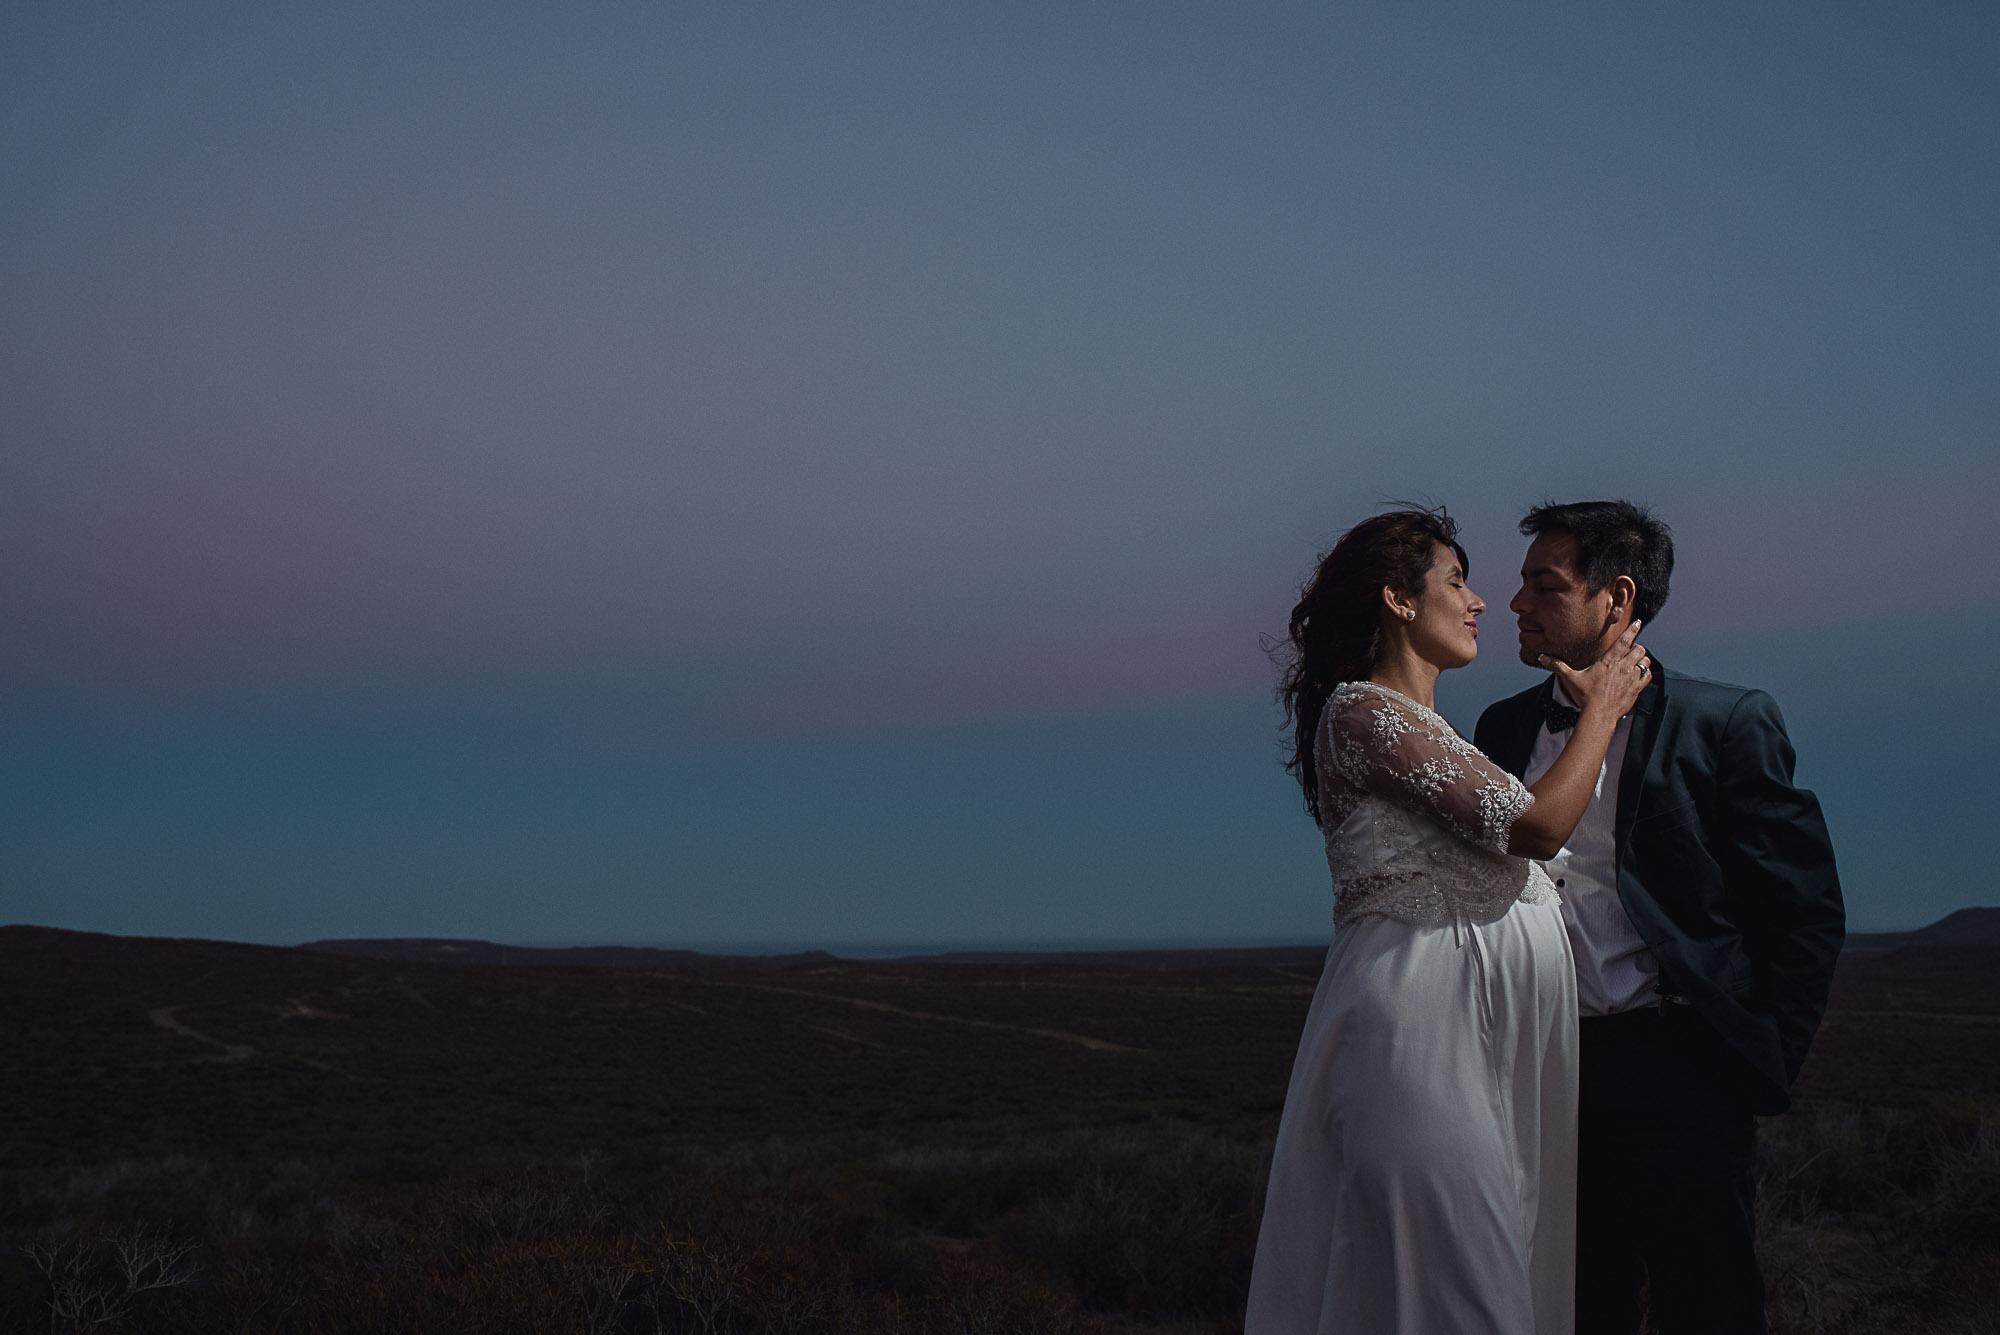 post-boda-trash-the-dress-marifer-y-felix-fotografia-de-bodas-en-patagonia-gabriel-roa-photography-19